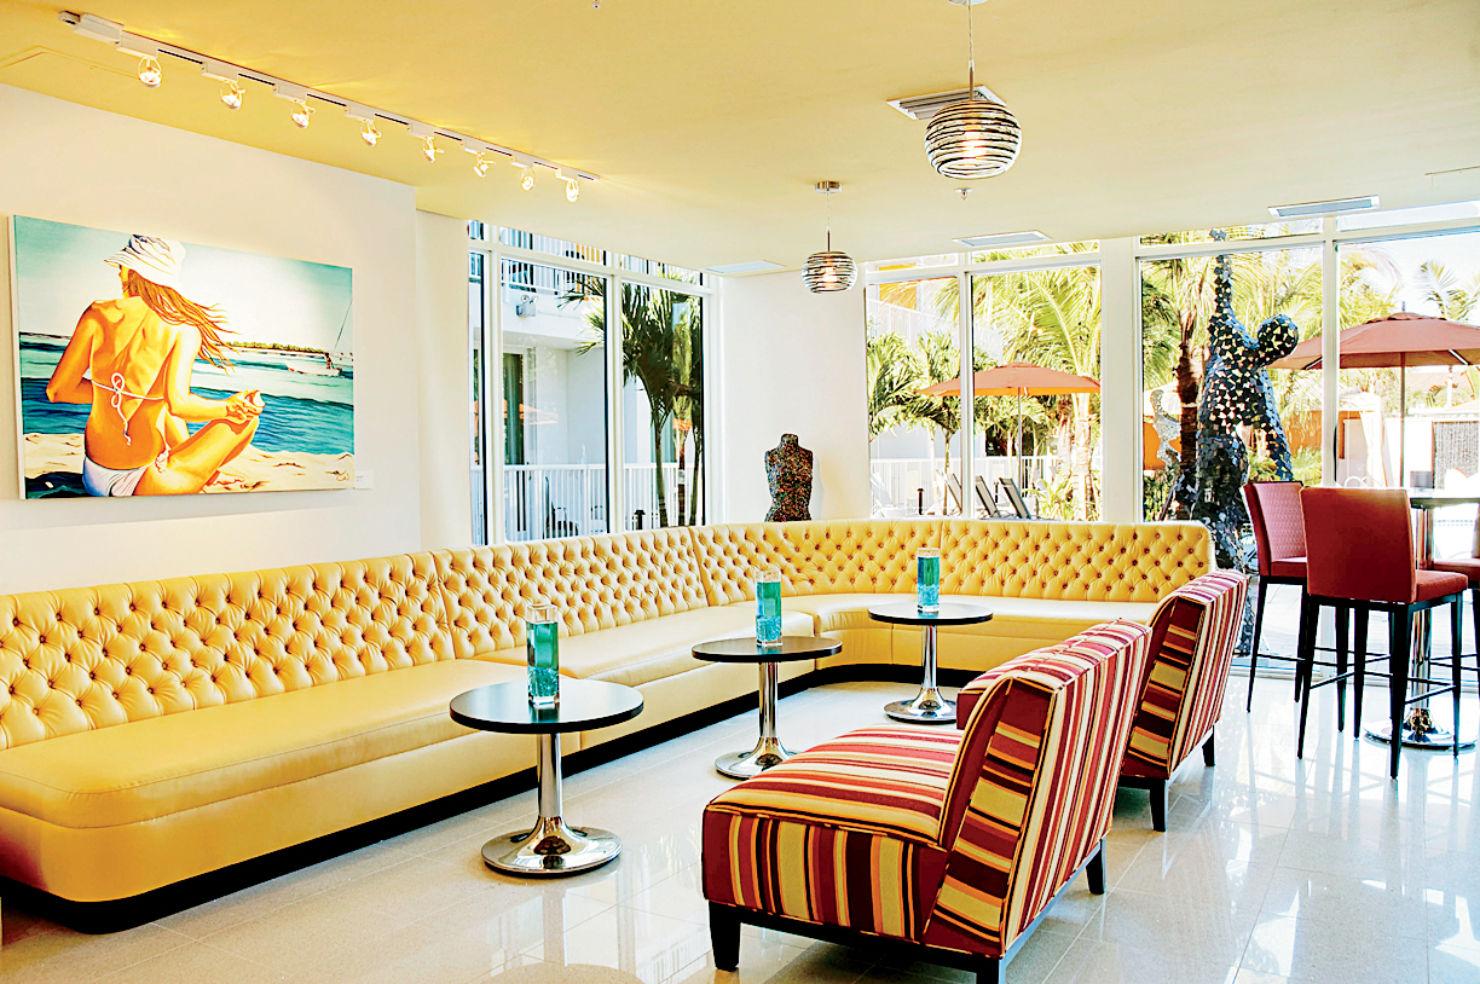 Hotel Urbano lounge